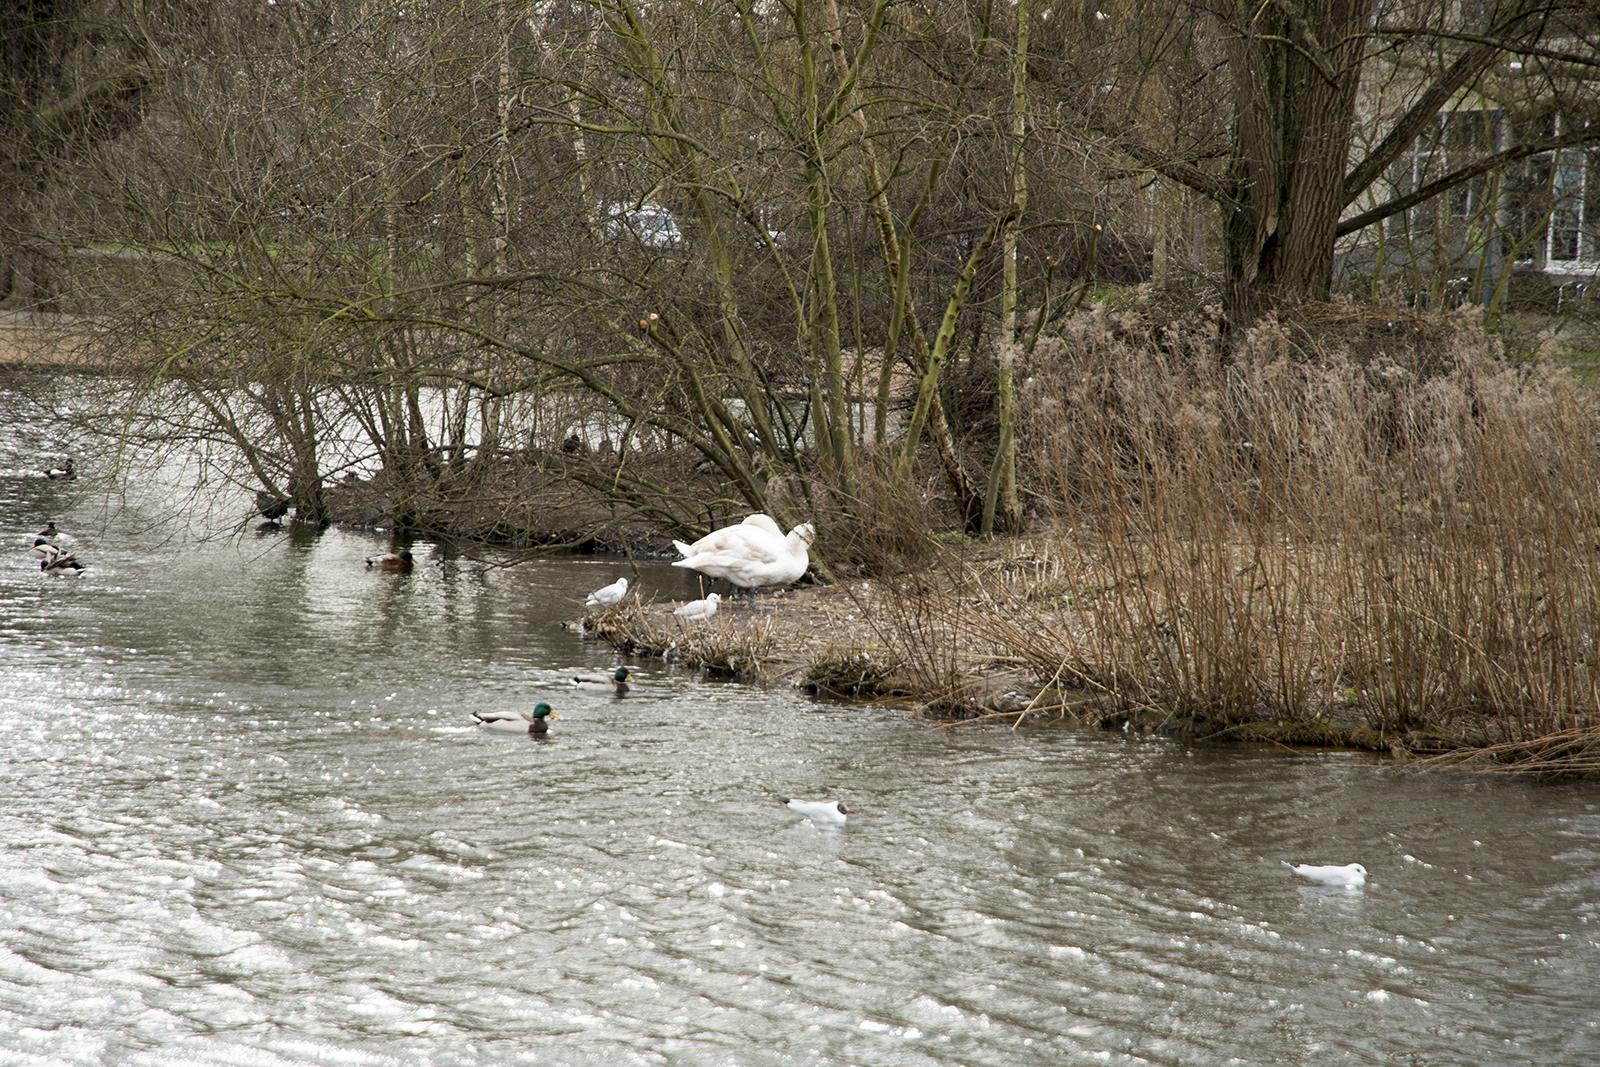 20170223_Richmond_Barnes_Landscape_Winter_Barnes-Pond-even-the-birds-look-cold